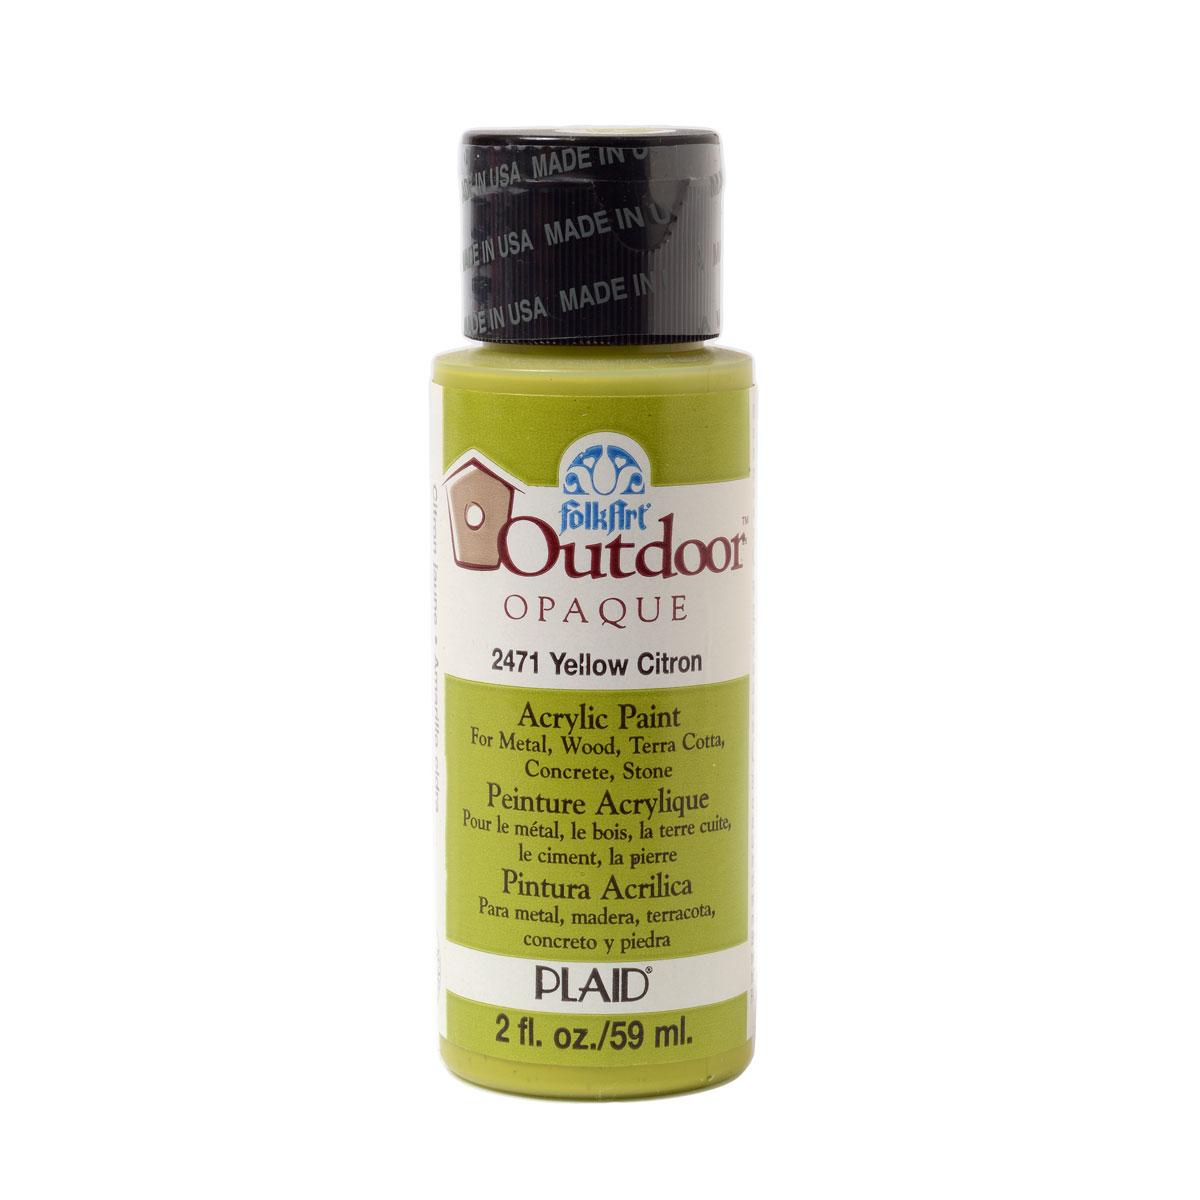 FolkArt ® Outdoor™ Acrylic Colors - Yellow Citron, 2 oz. - 2471